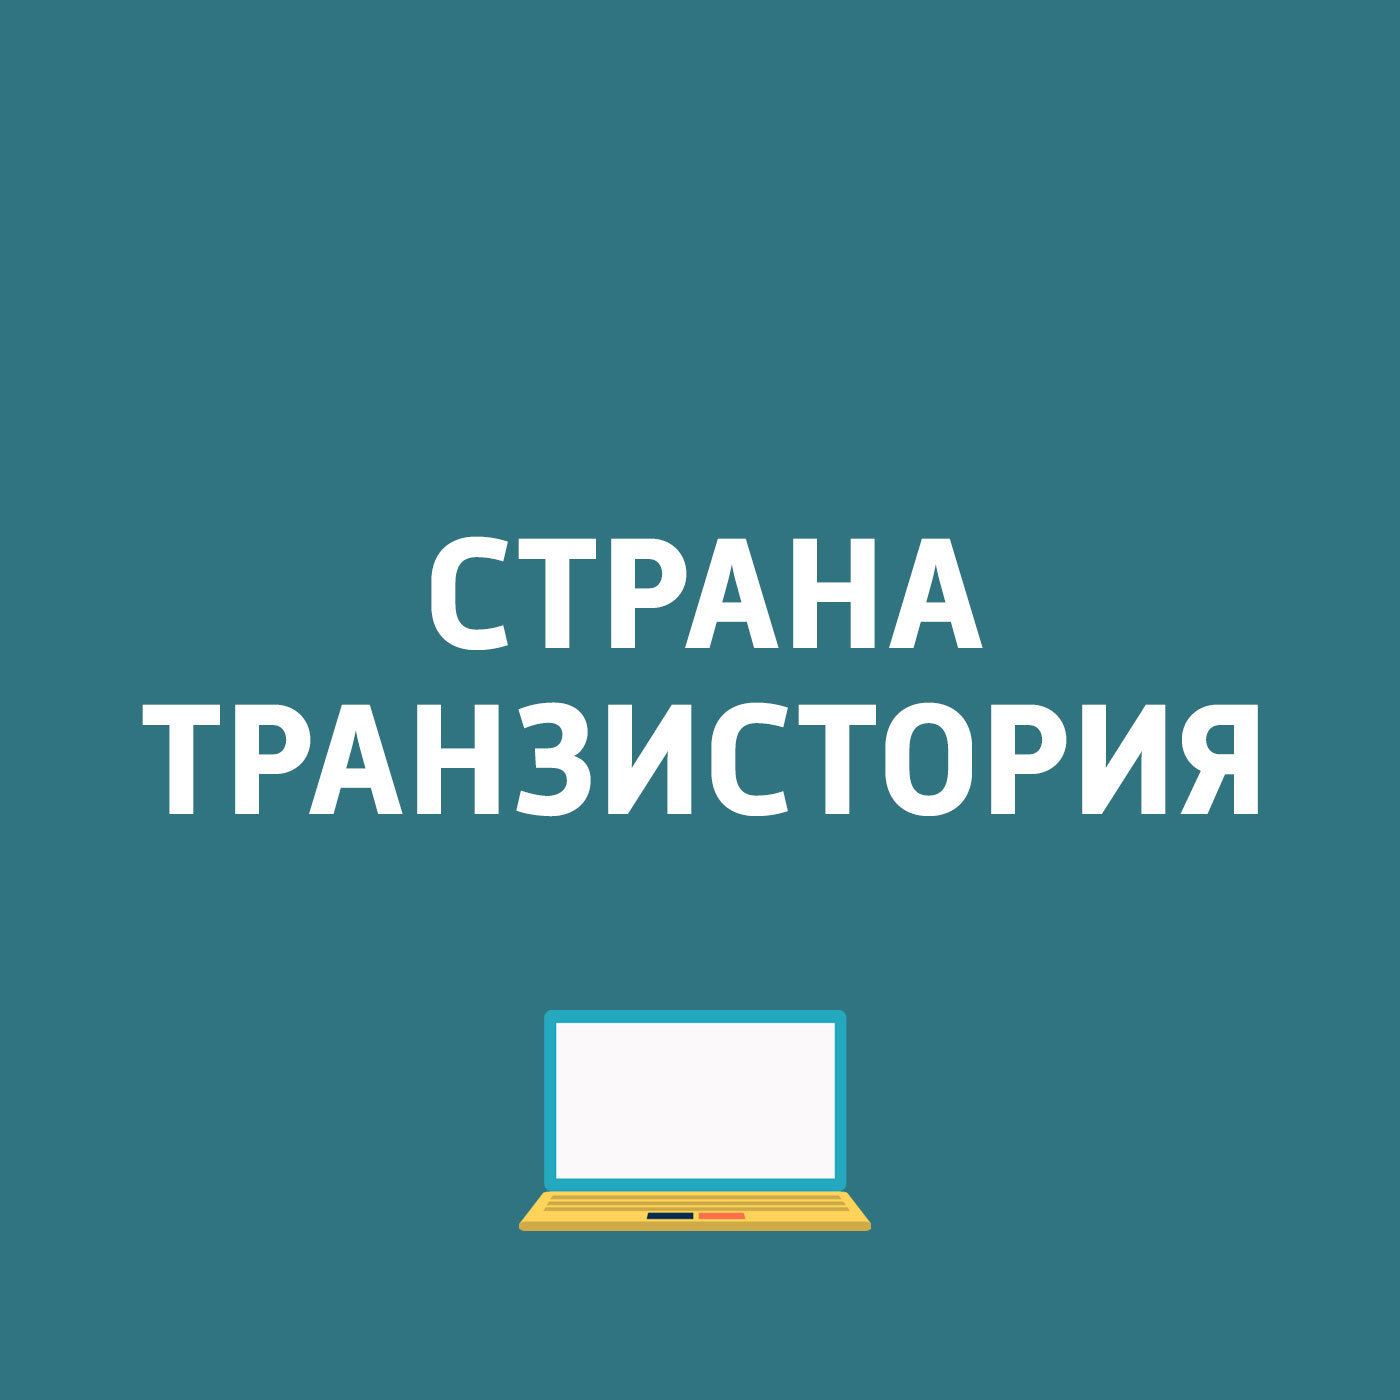 Картаев Павел Яндекс объявил об улучшении сервиса Яндекс.Погода яндекс